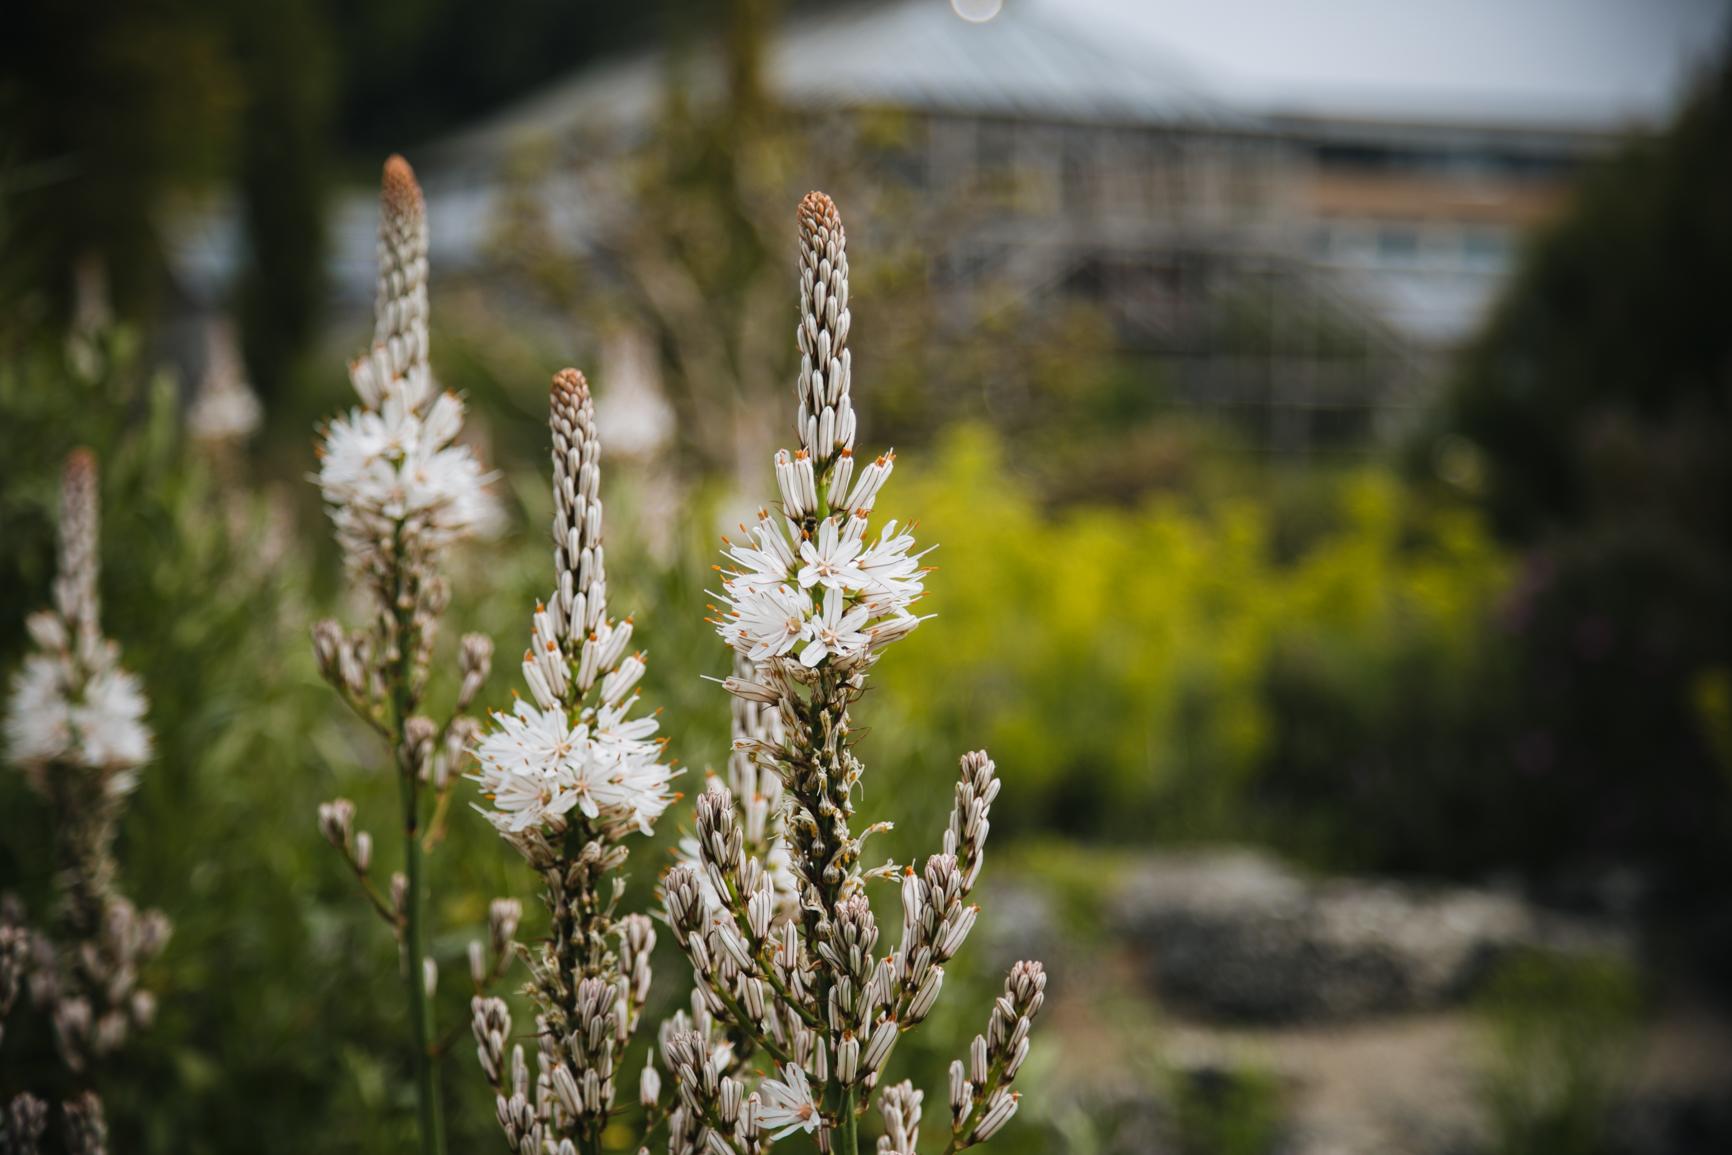 Jardin-botanique-universite-de-cambridge-voyage.jpg